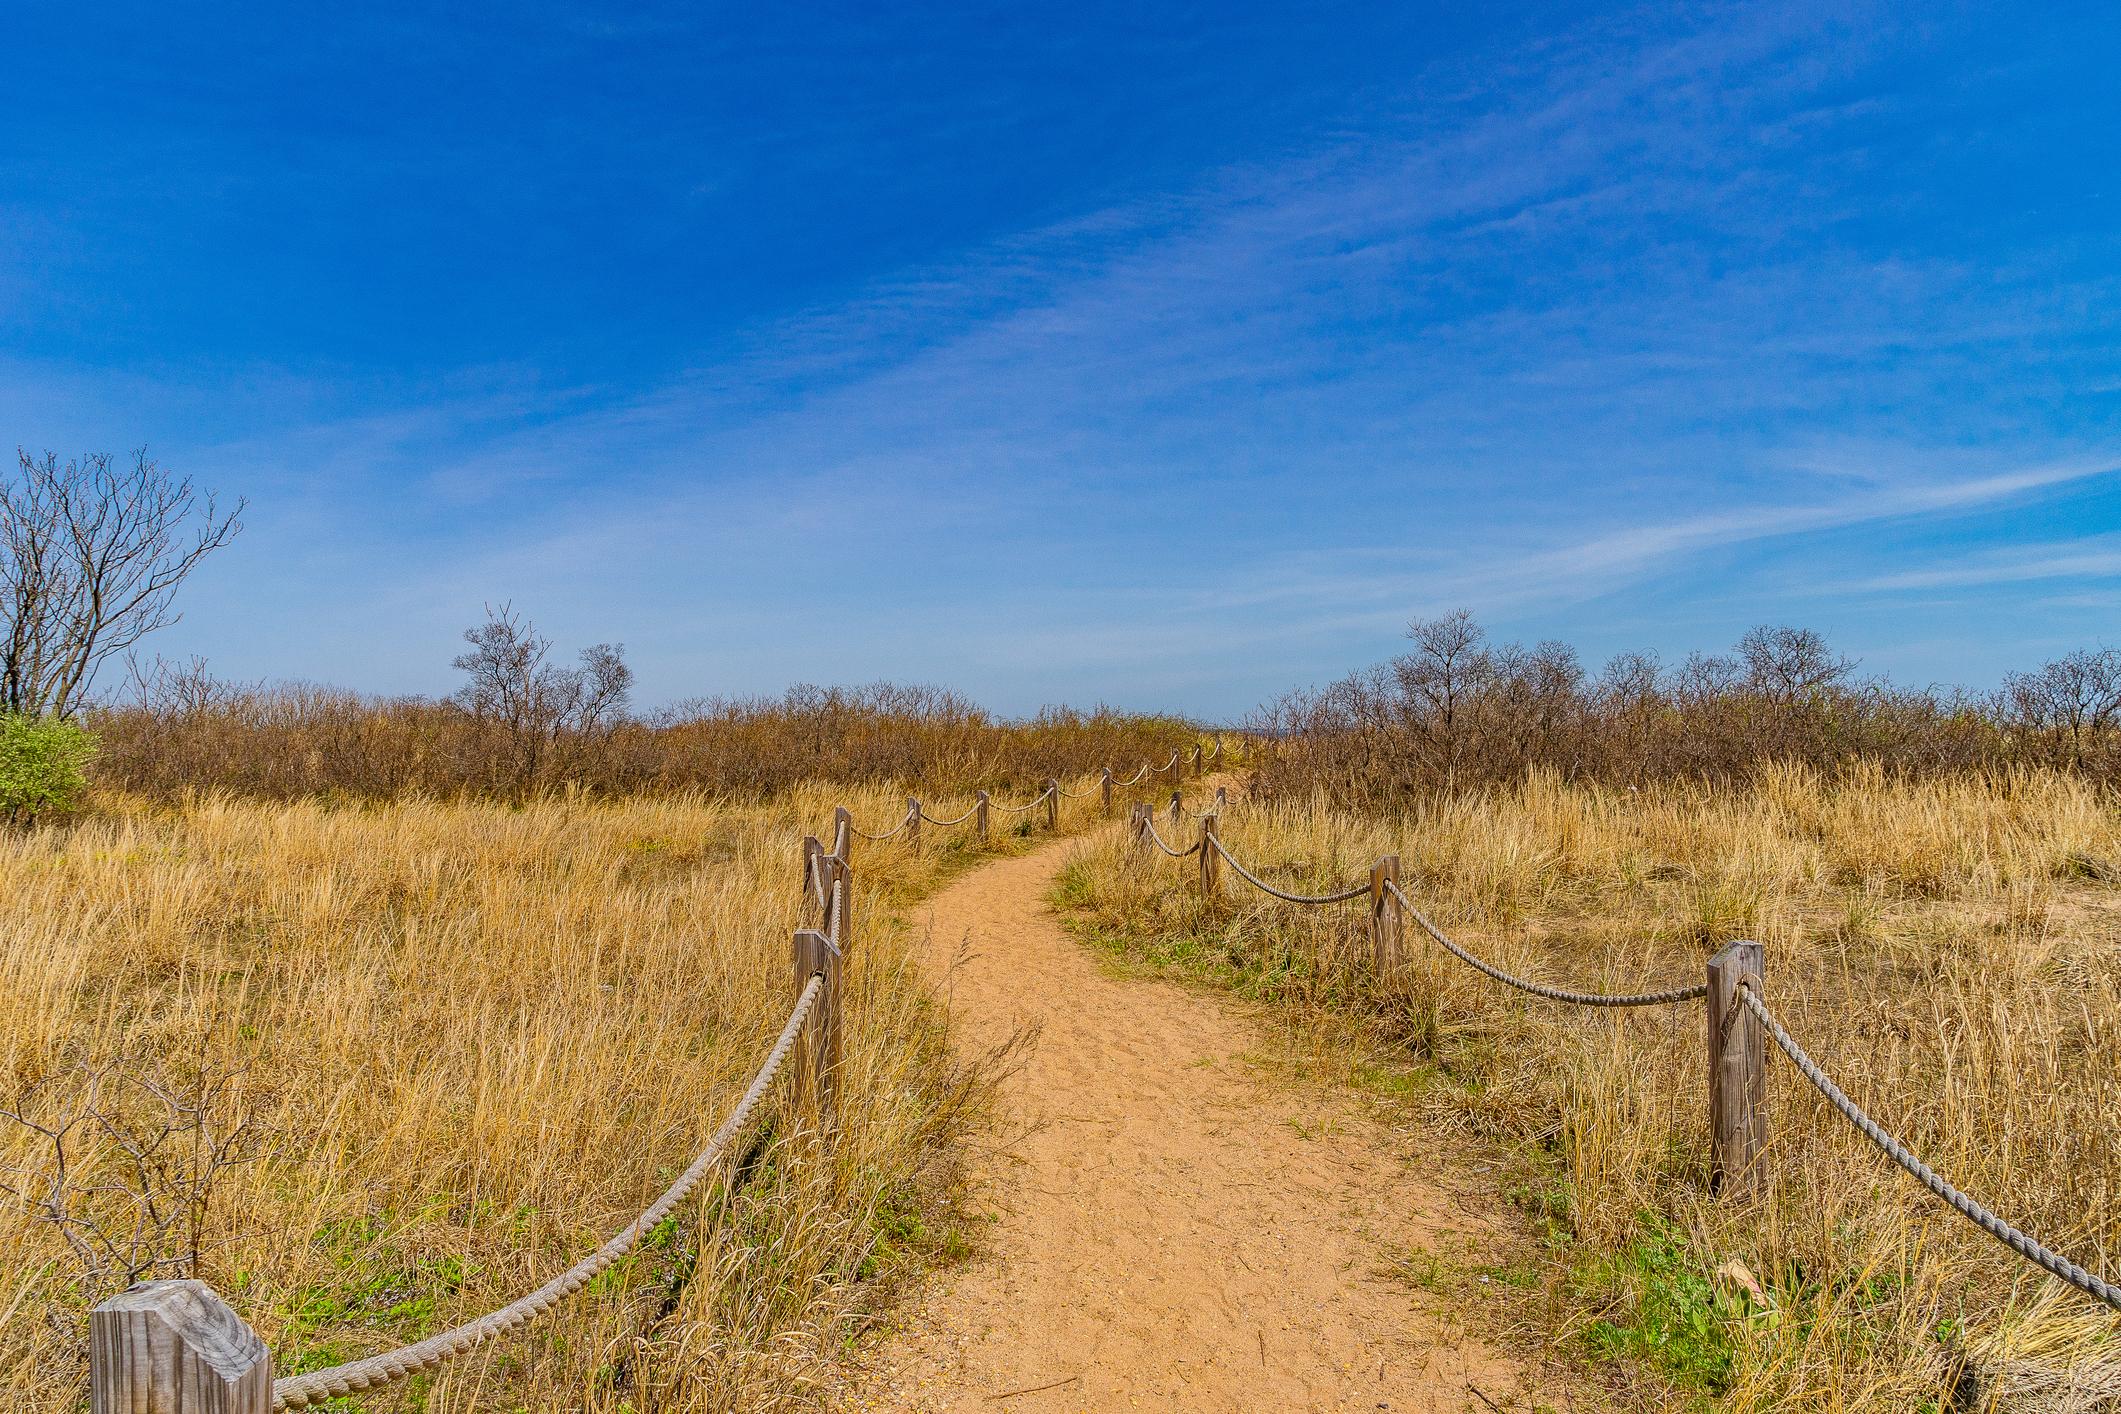 Trail-sand-dunes-Staten-Island-New-York ▷ 7 cosas que hacer en Staten Island, Nueva York